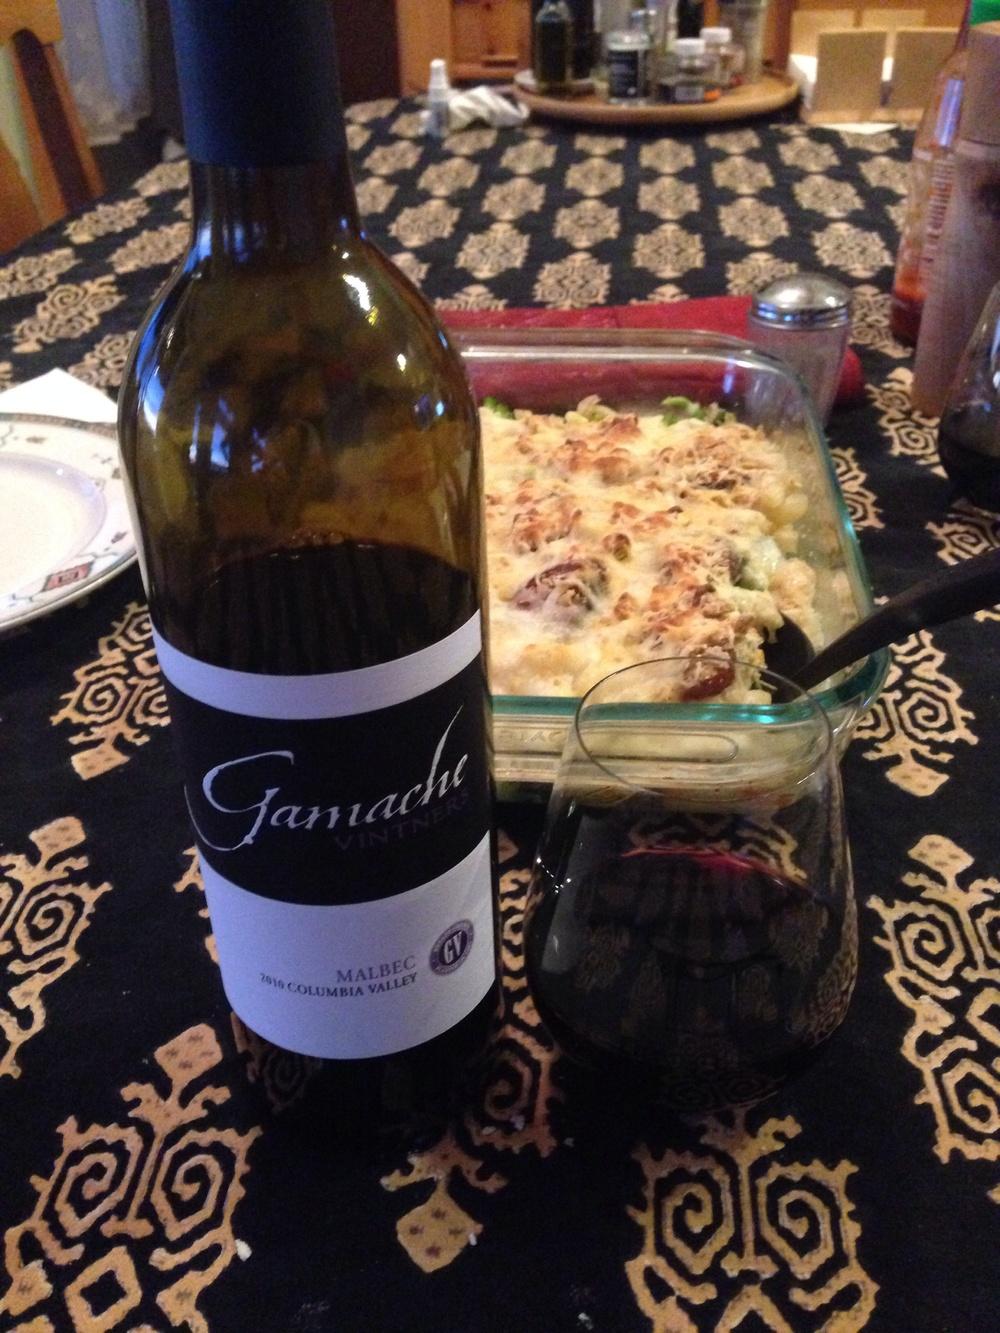 #Gamache winery #prosserwine